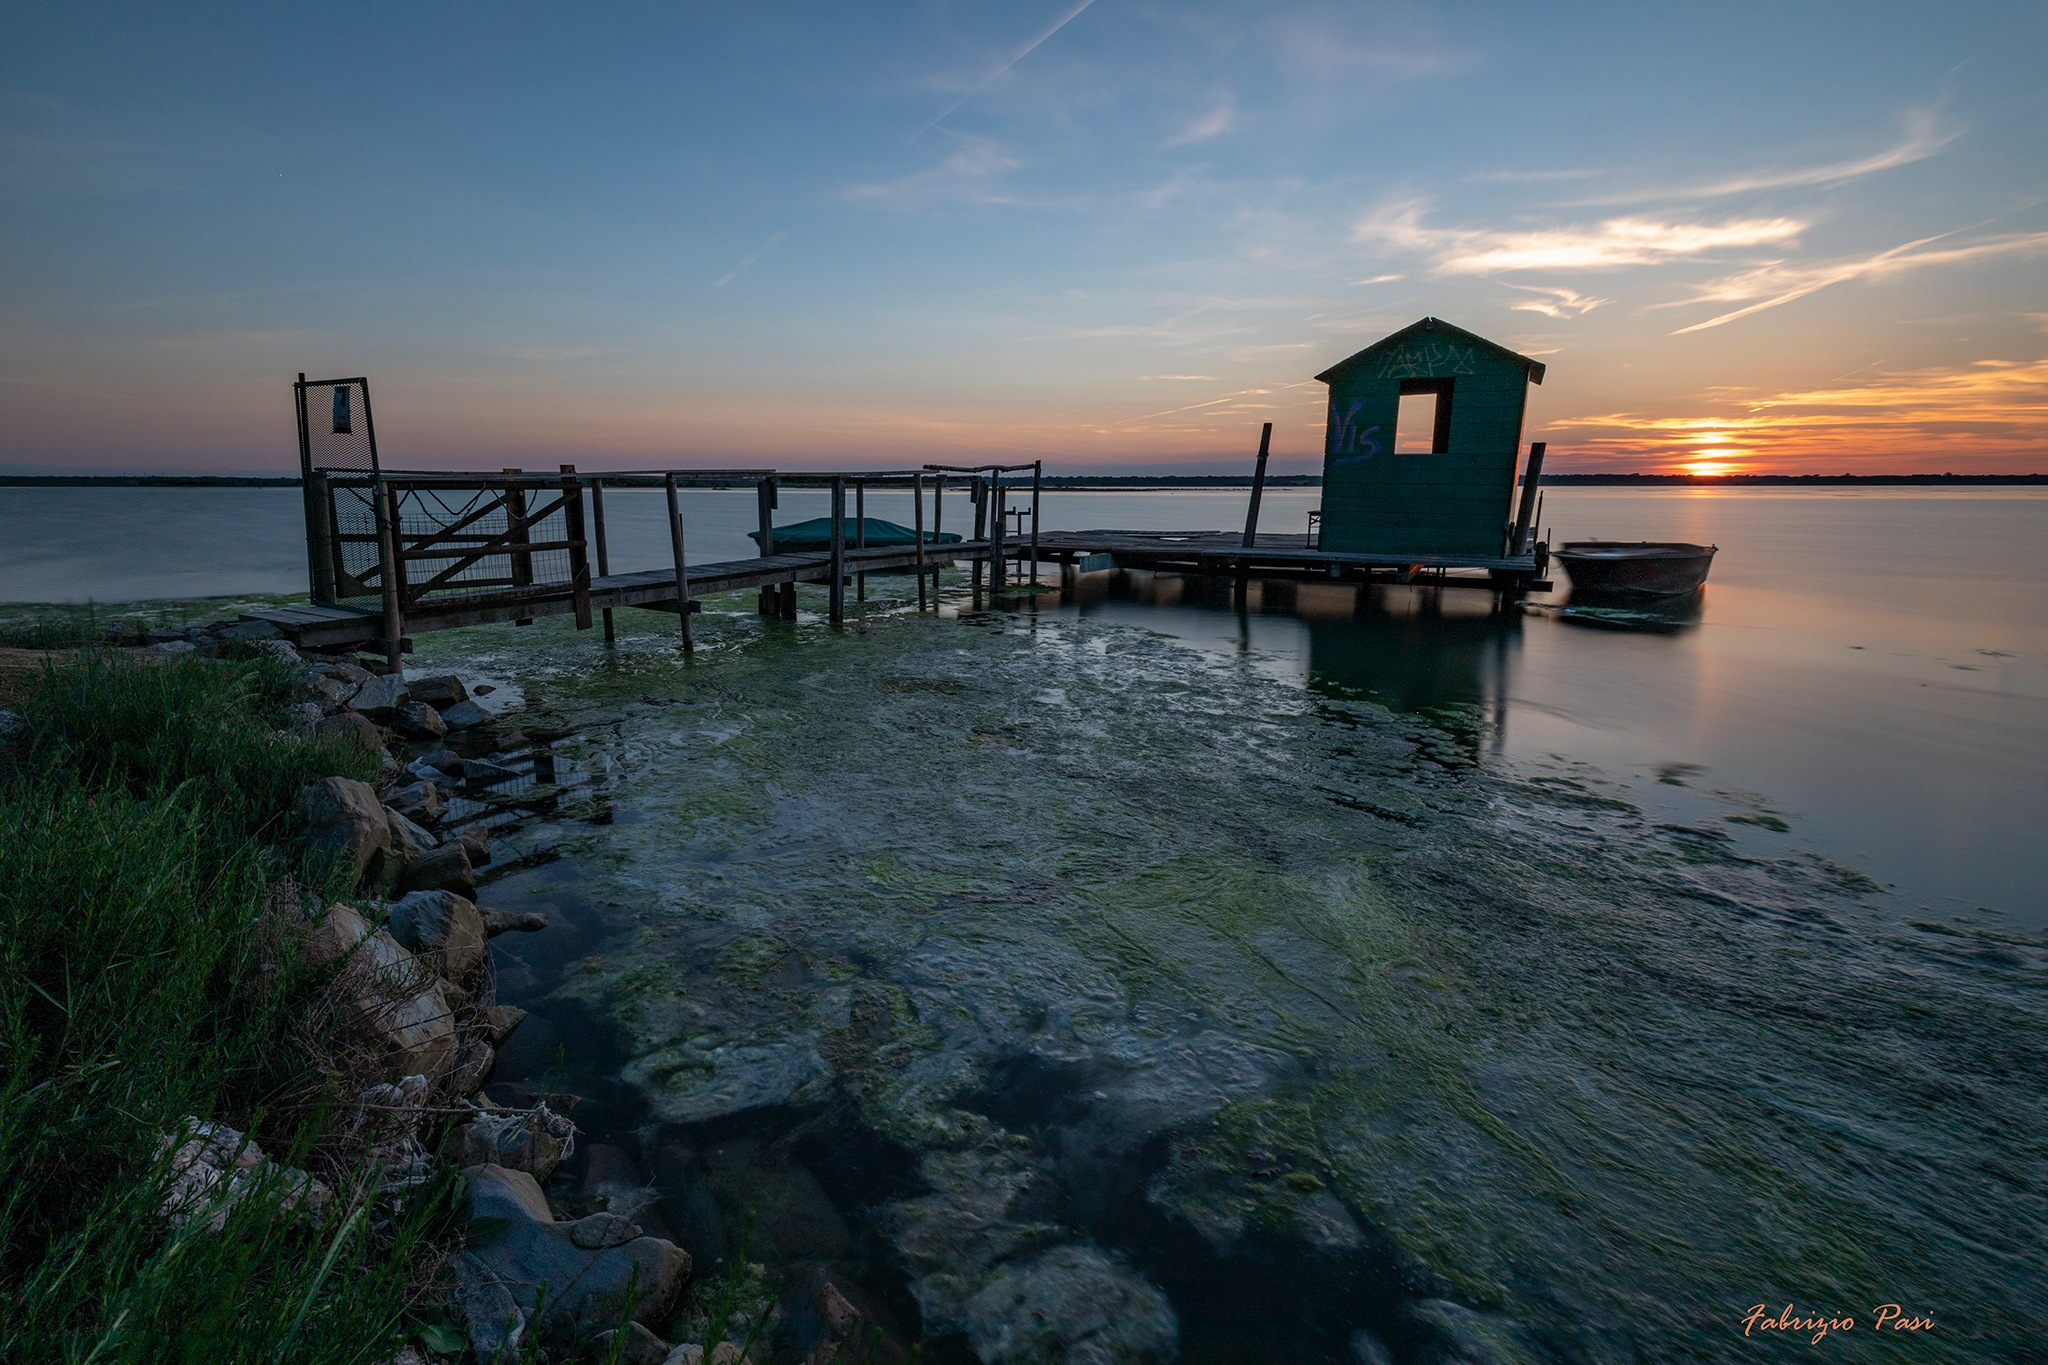 Sunset in Marina Romea by fabriziopasi2662